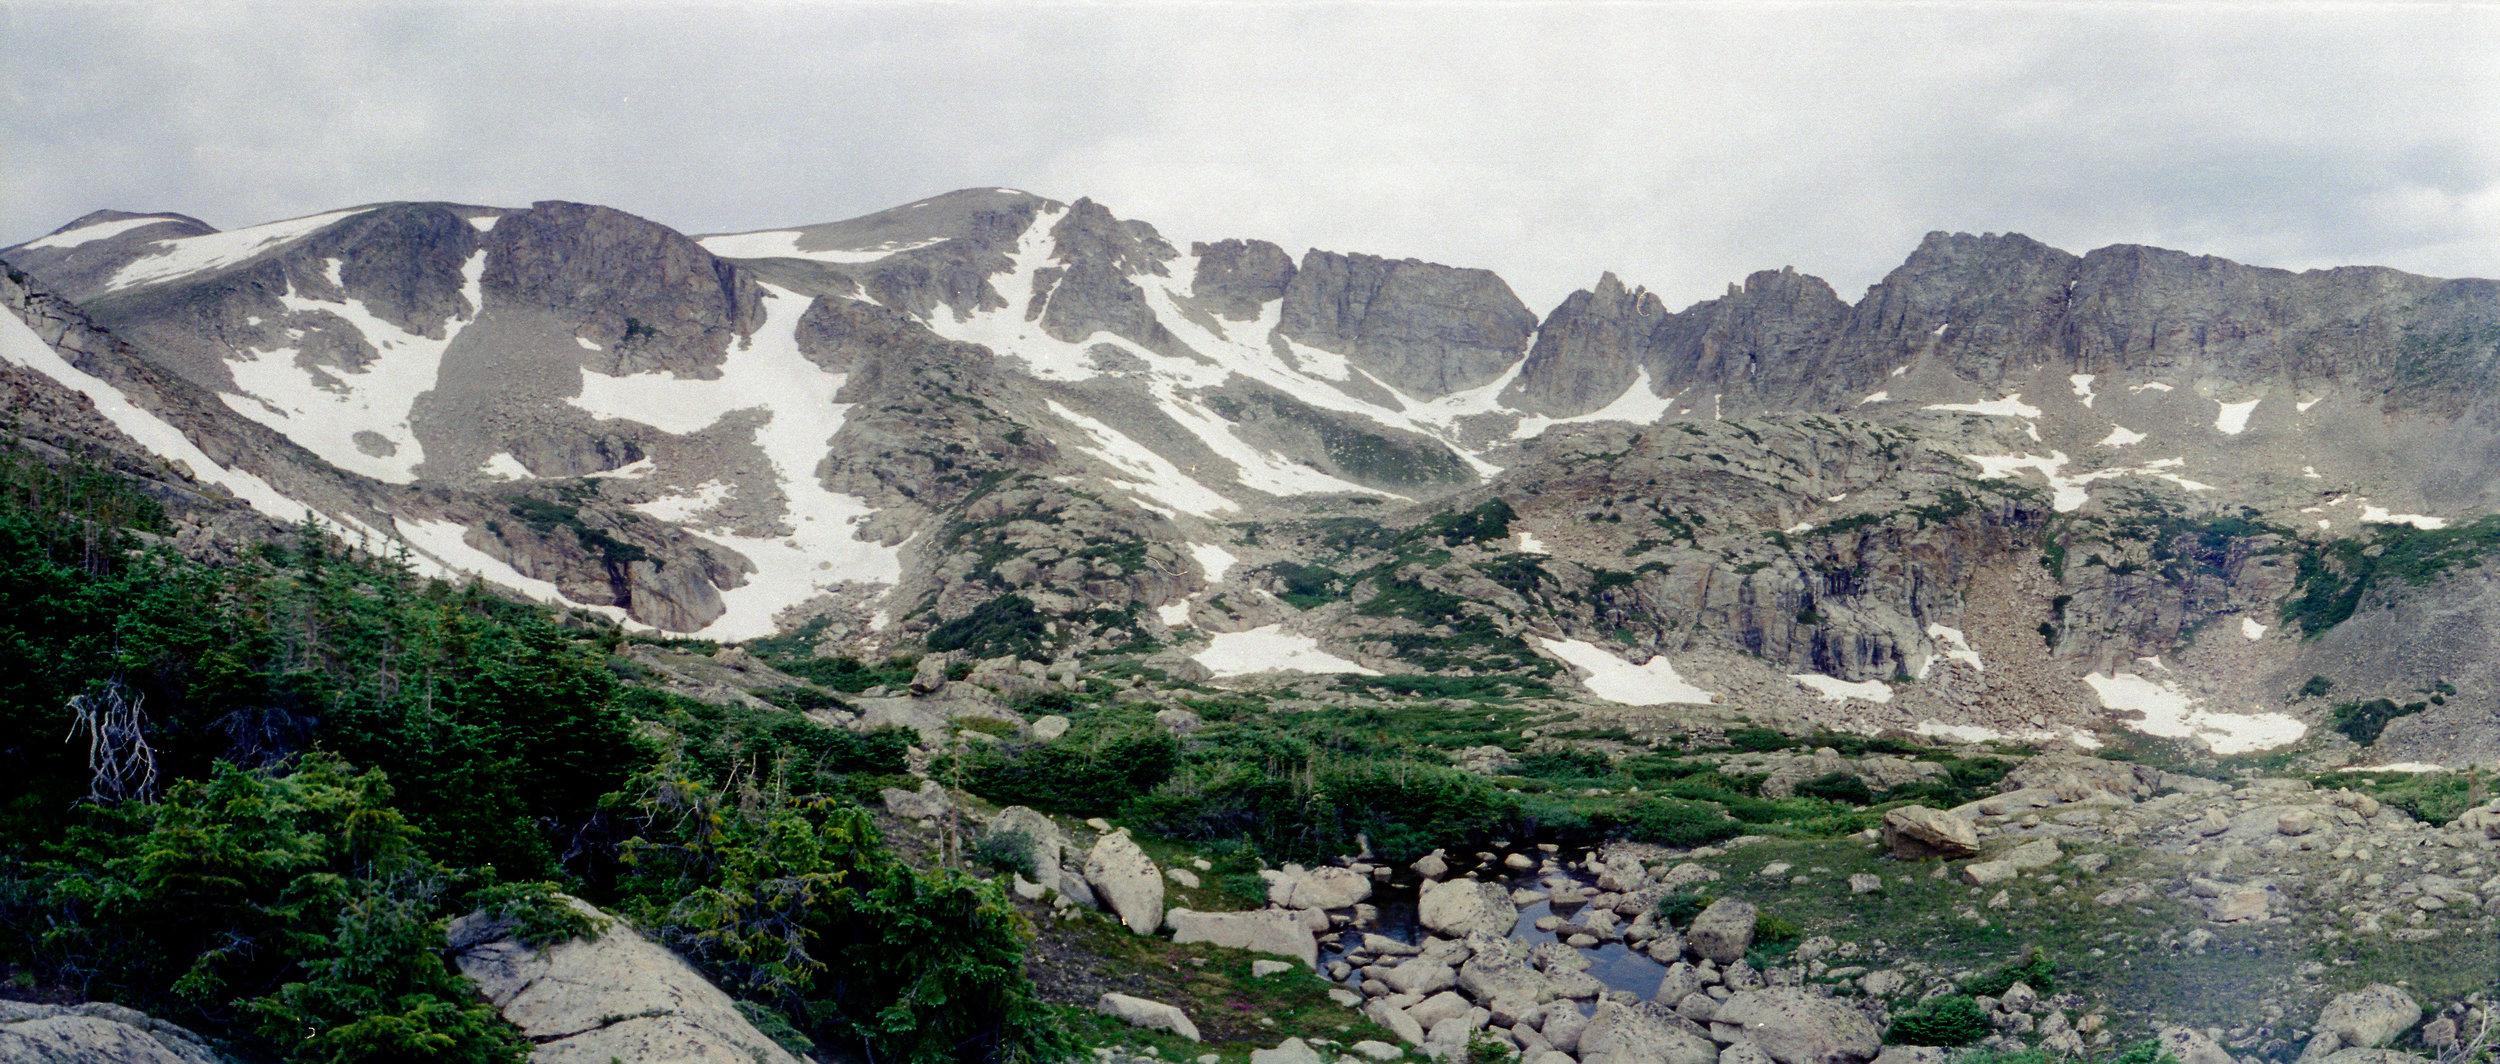 Horizont - Kodak 400 - 013 eh.jpg